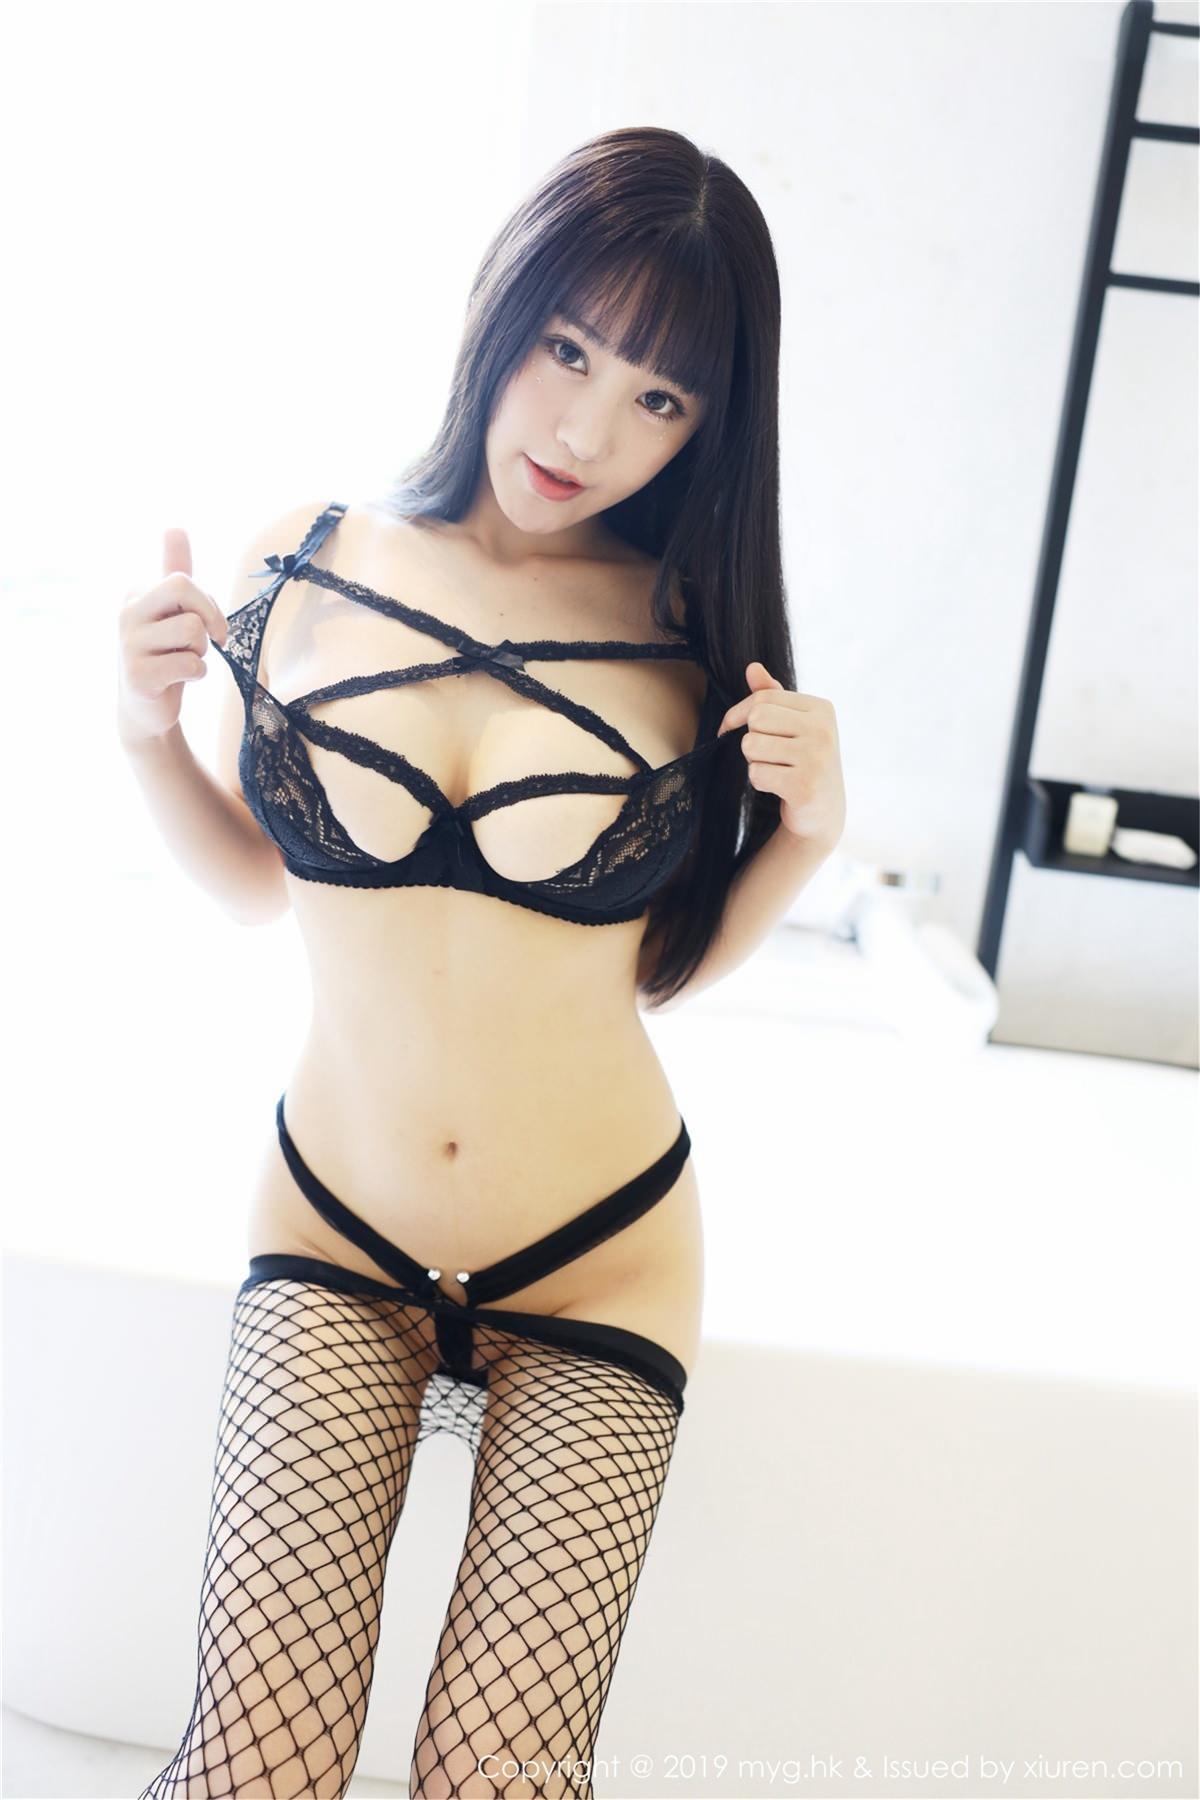 MyGirl Vol.357 89P, mygirl, Zhu Ke Er